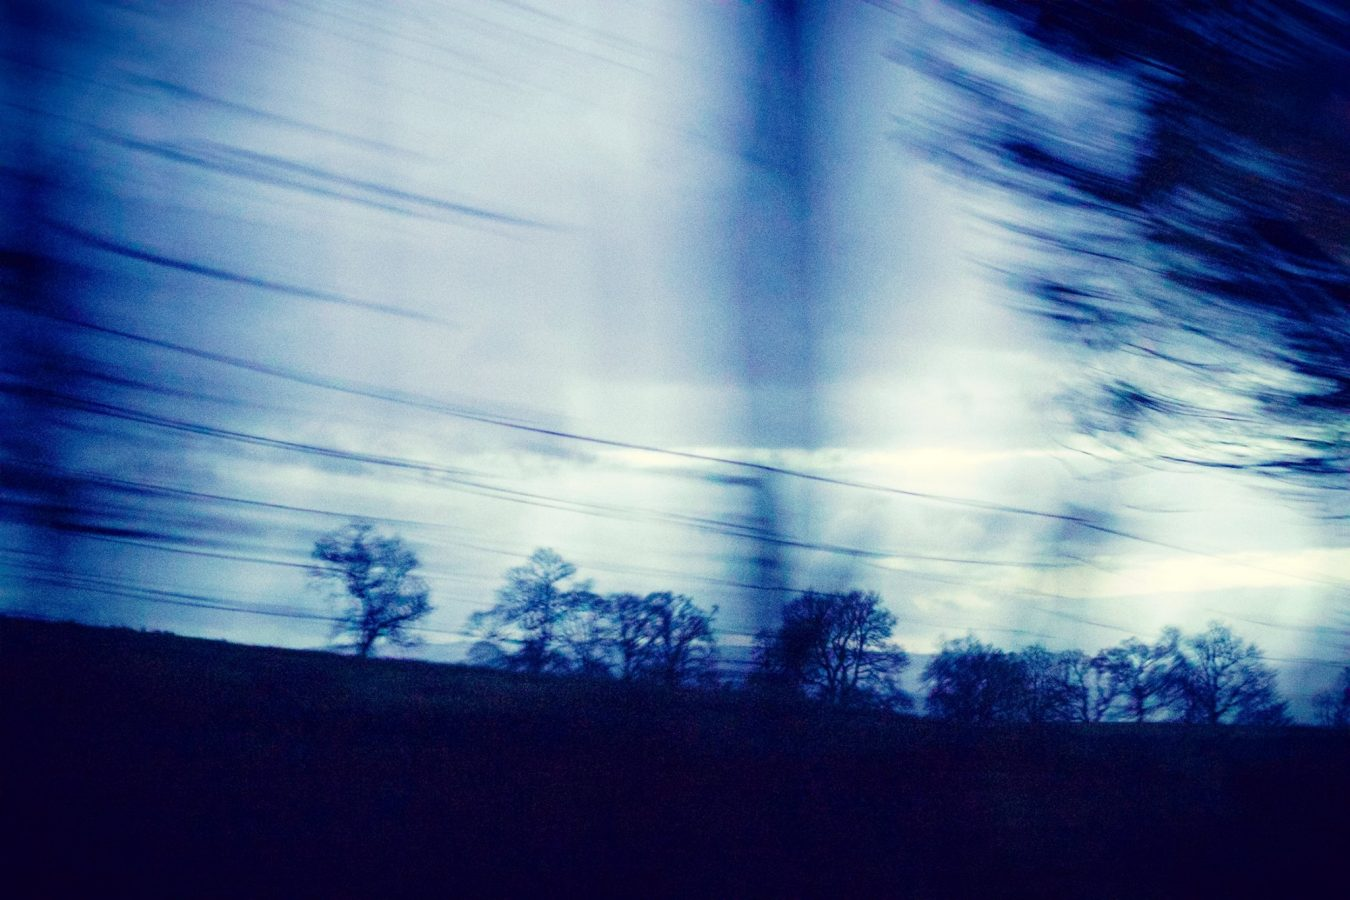 Experimental photo